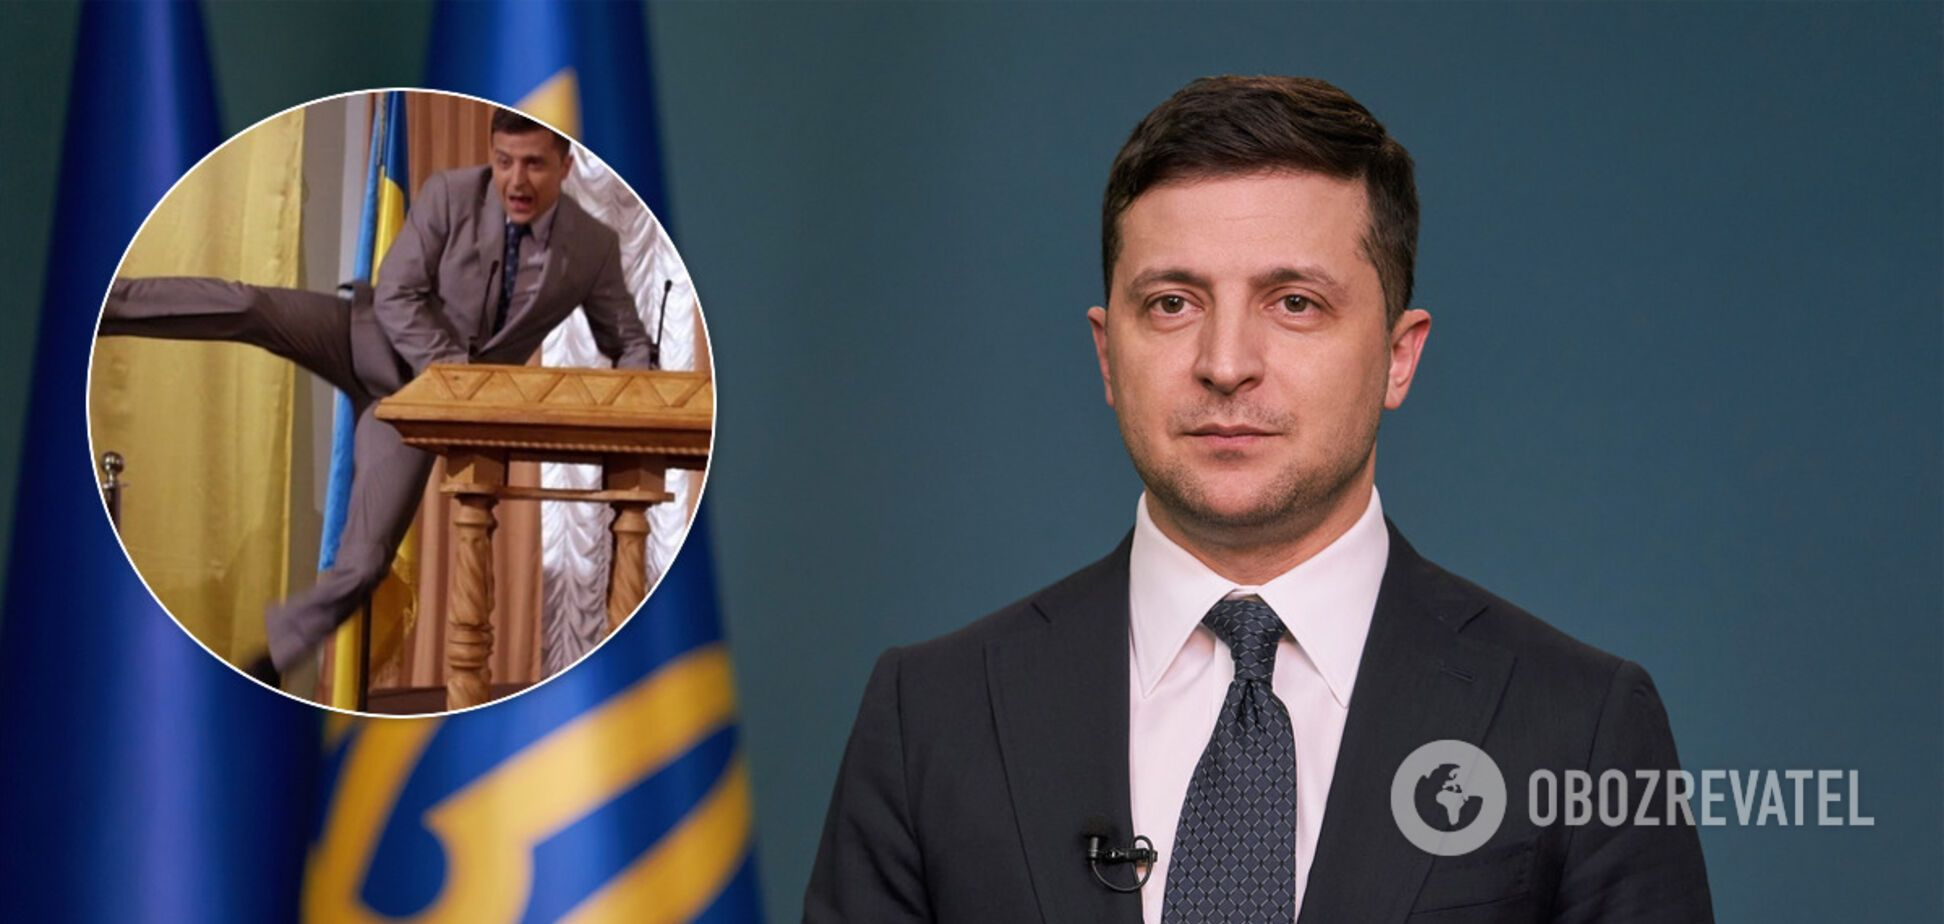 Зеленский сравнил президентство со 'Слугой народа'